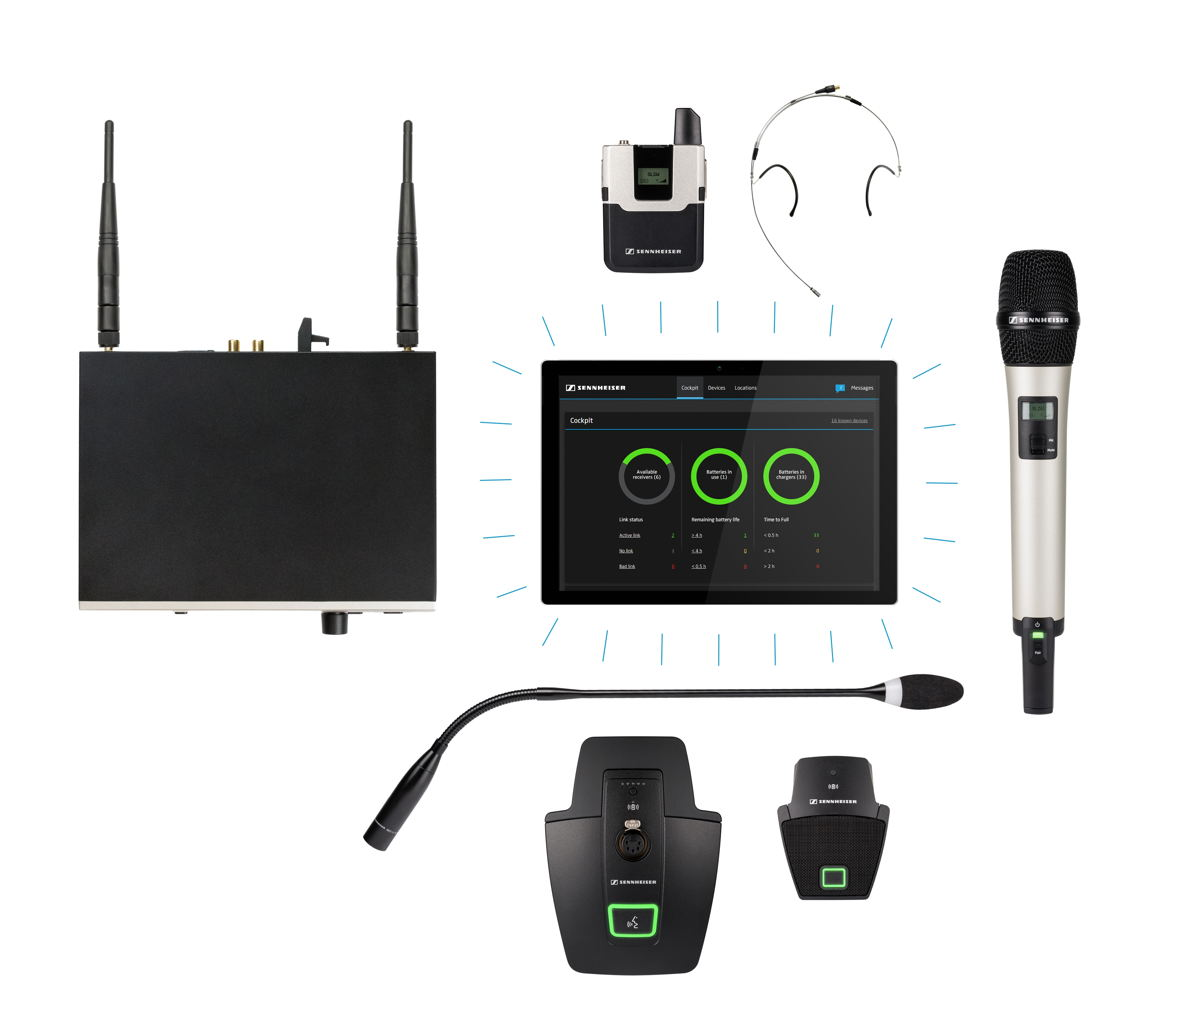 The Sennheiser SpeechLine Wireless Series provides specialist tools for speech applications